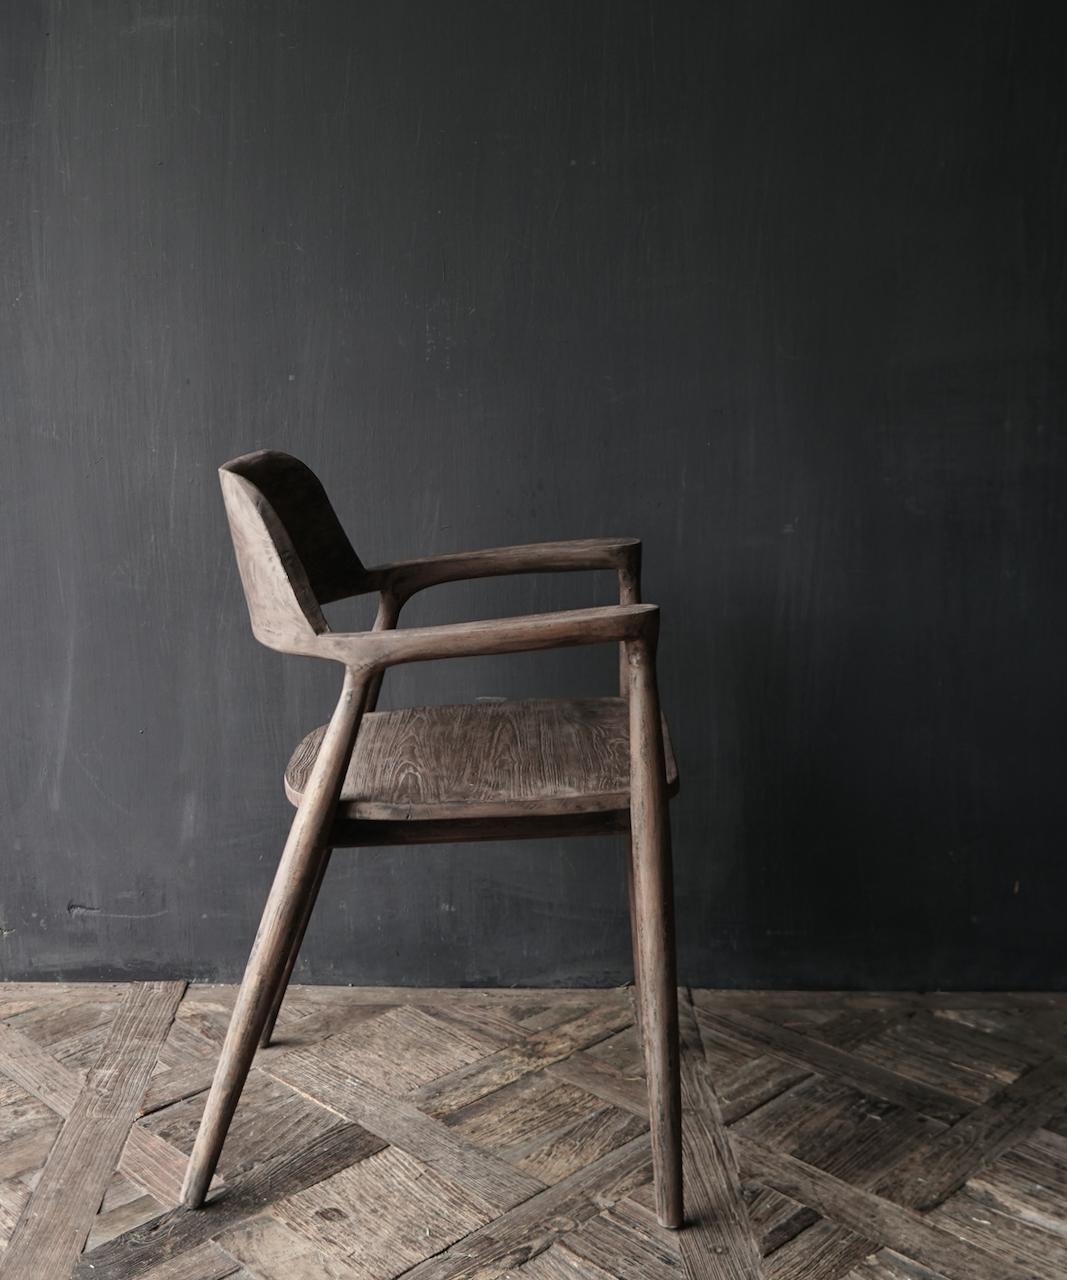 Alter alter Holzsessel aus Teakholz-4